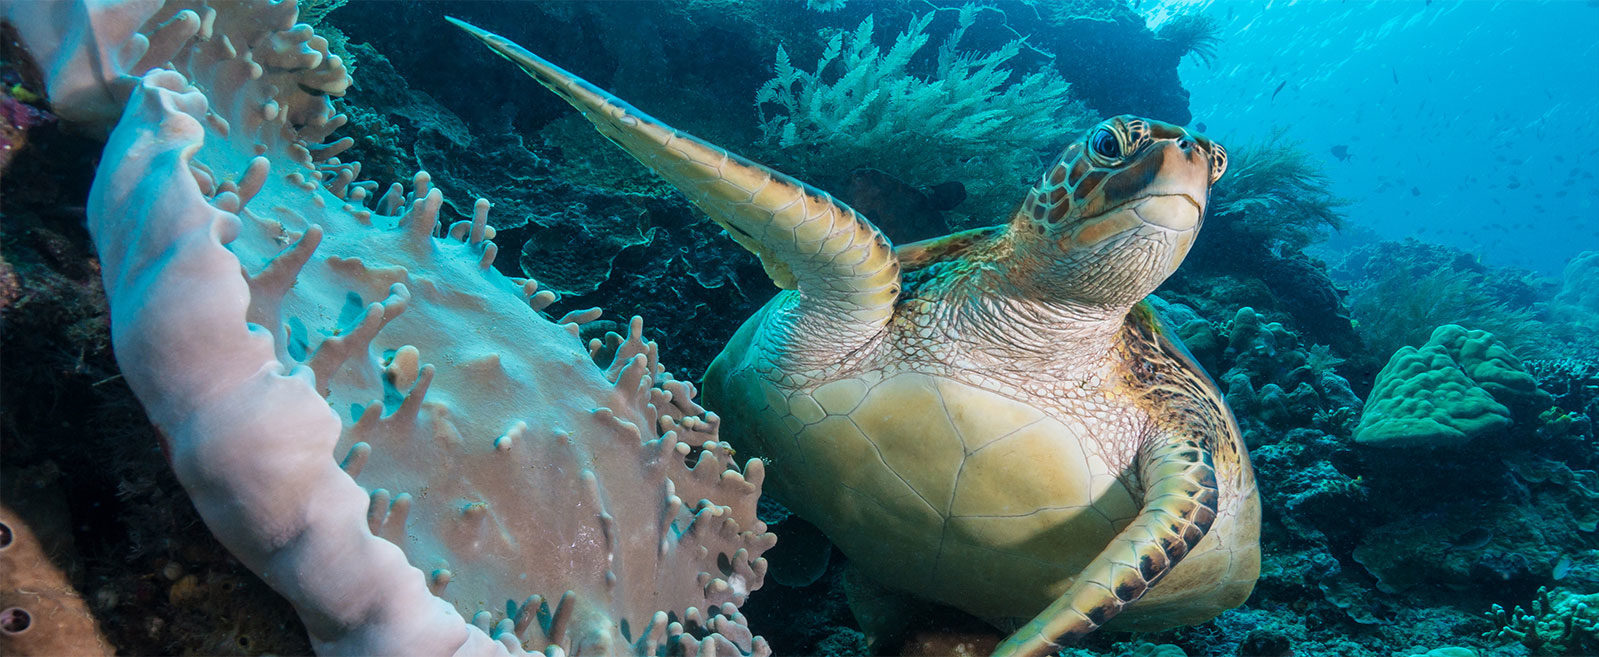 Indonesia, Manado, Bunaken, Island, Turtle